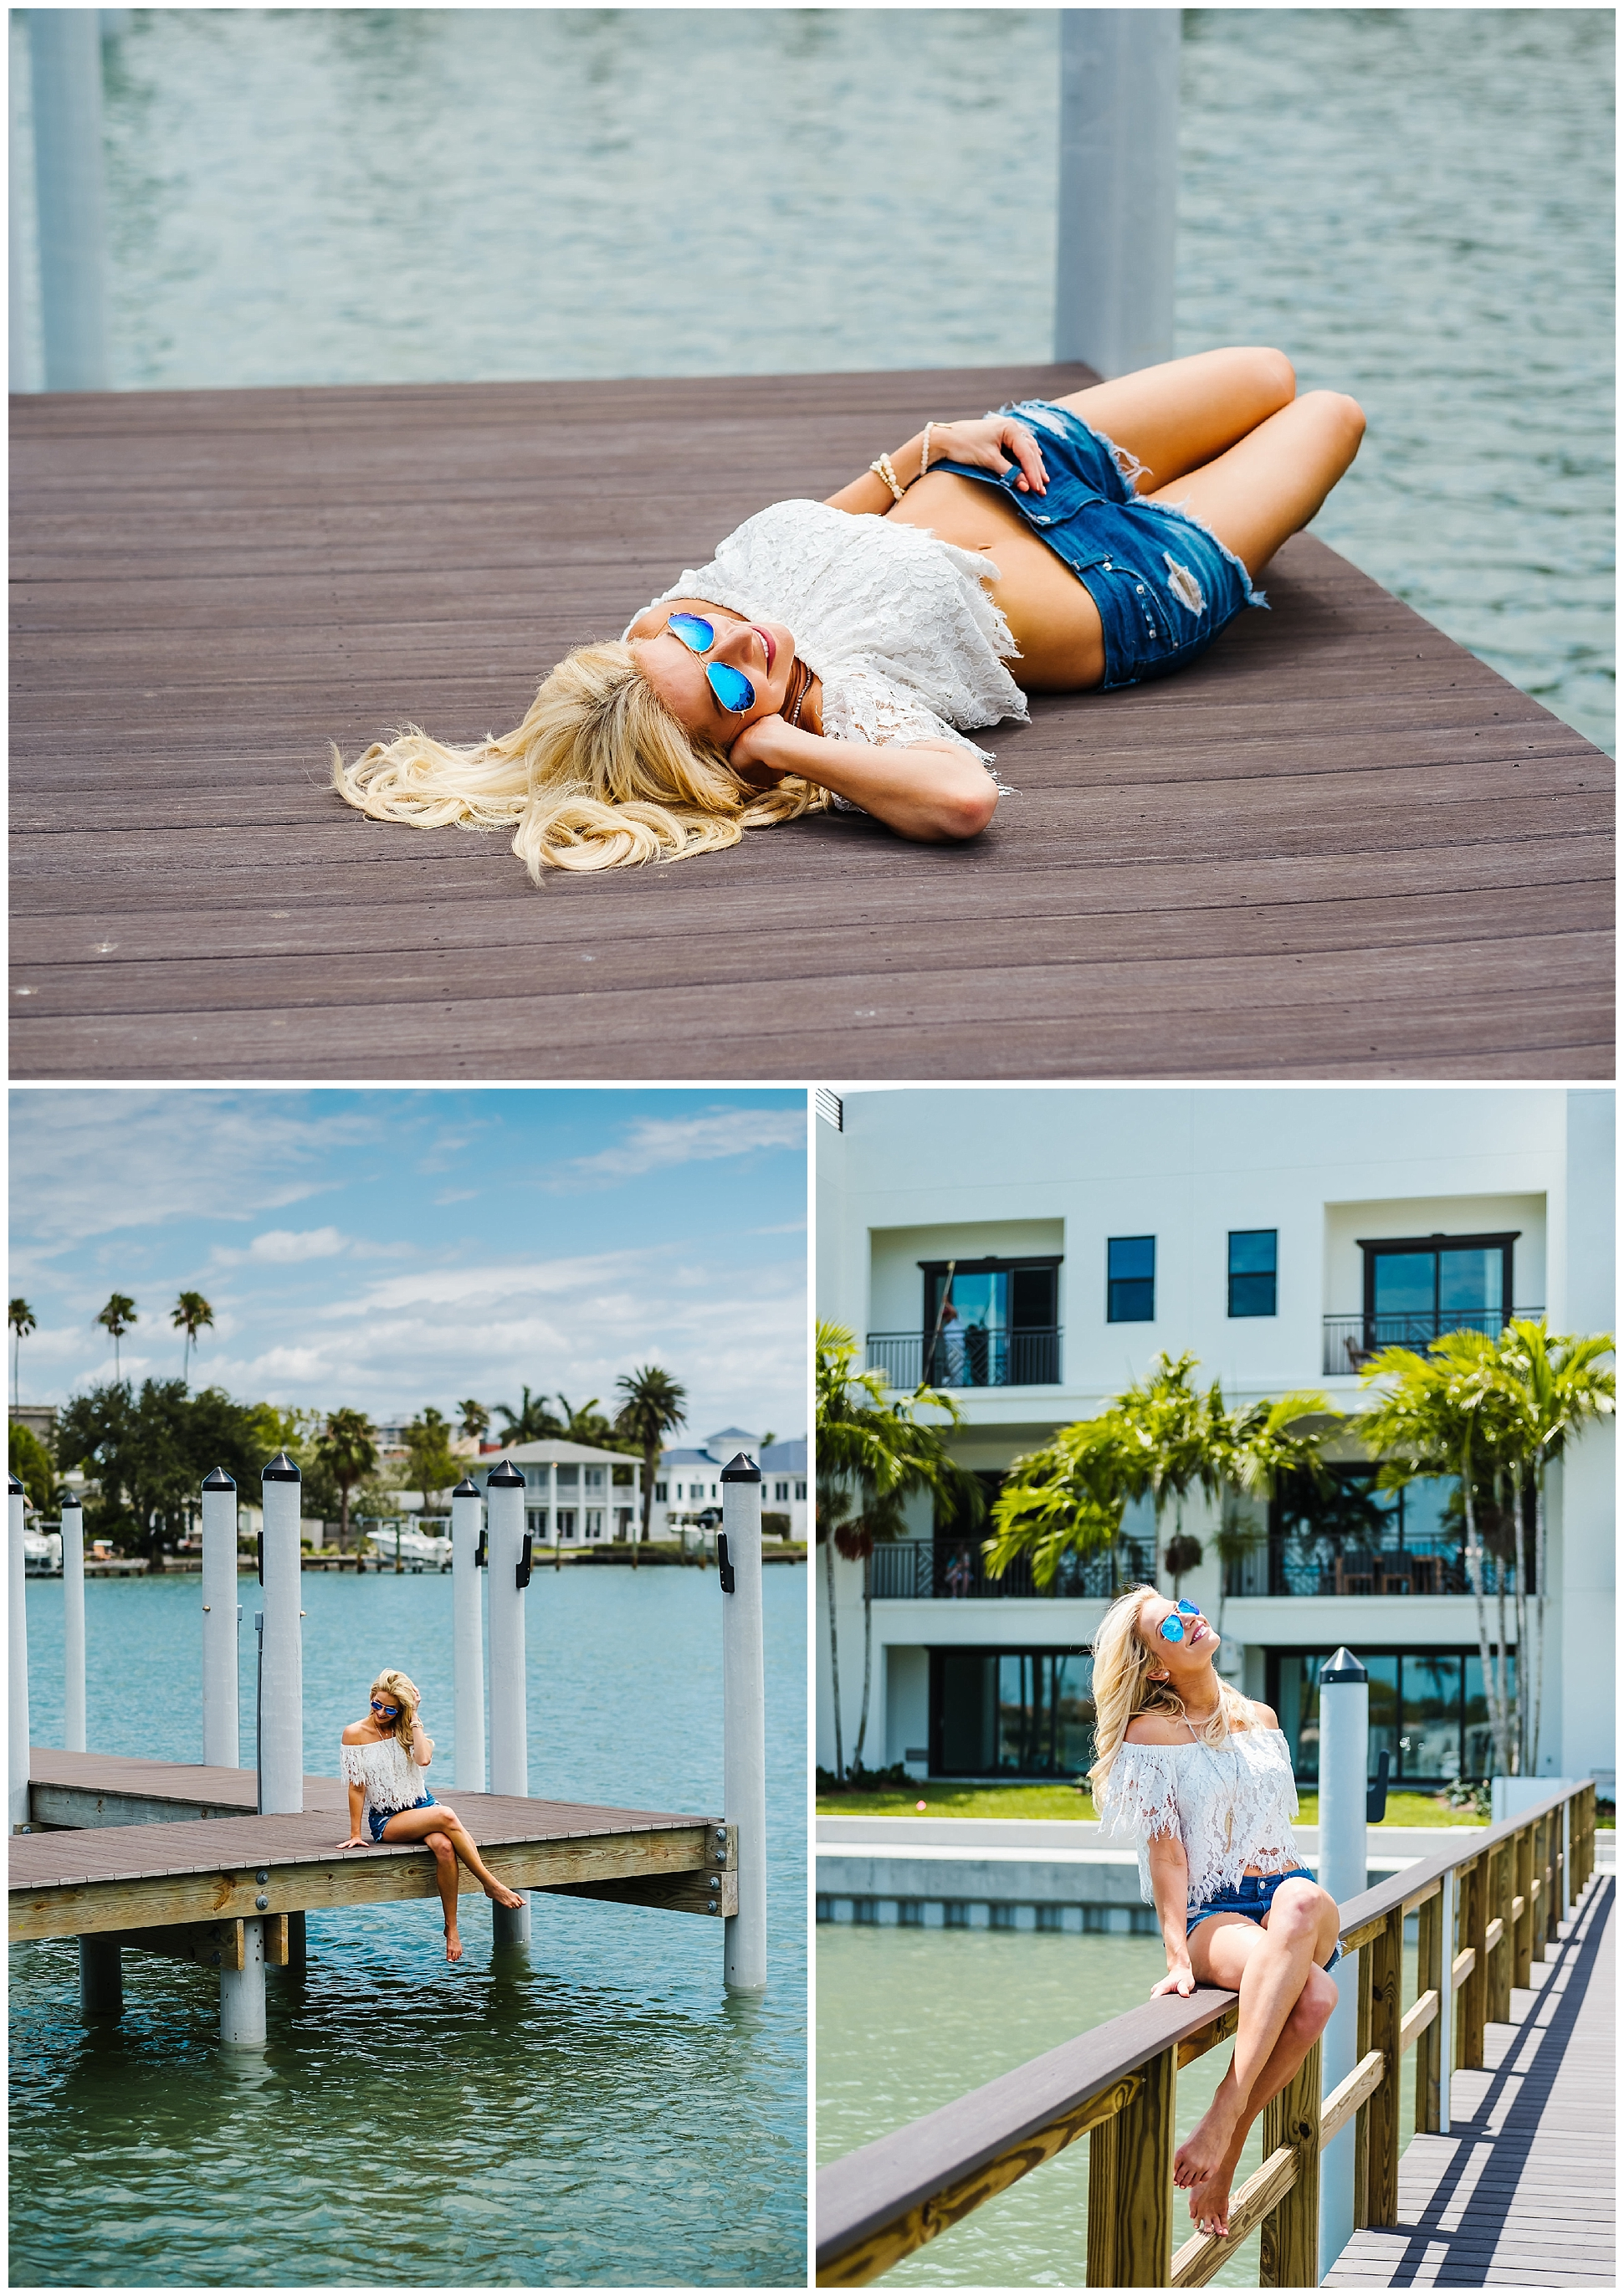 lindsay-matway-lifestyle-blogger_12.jpg